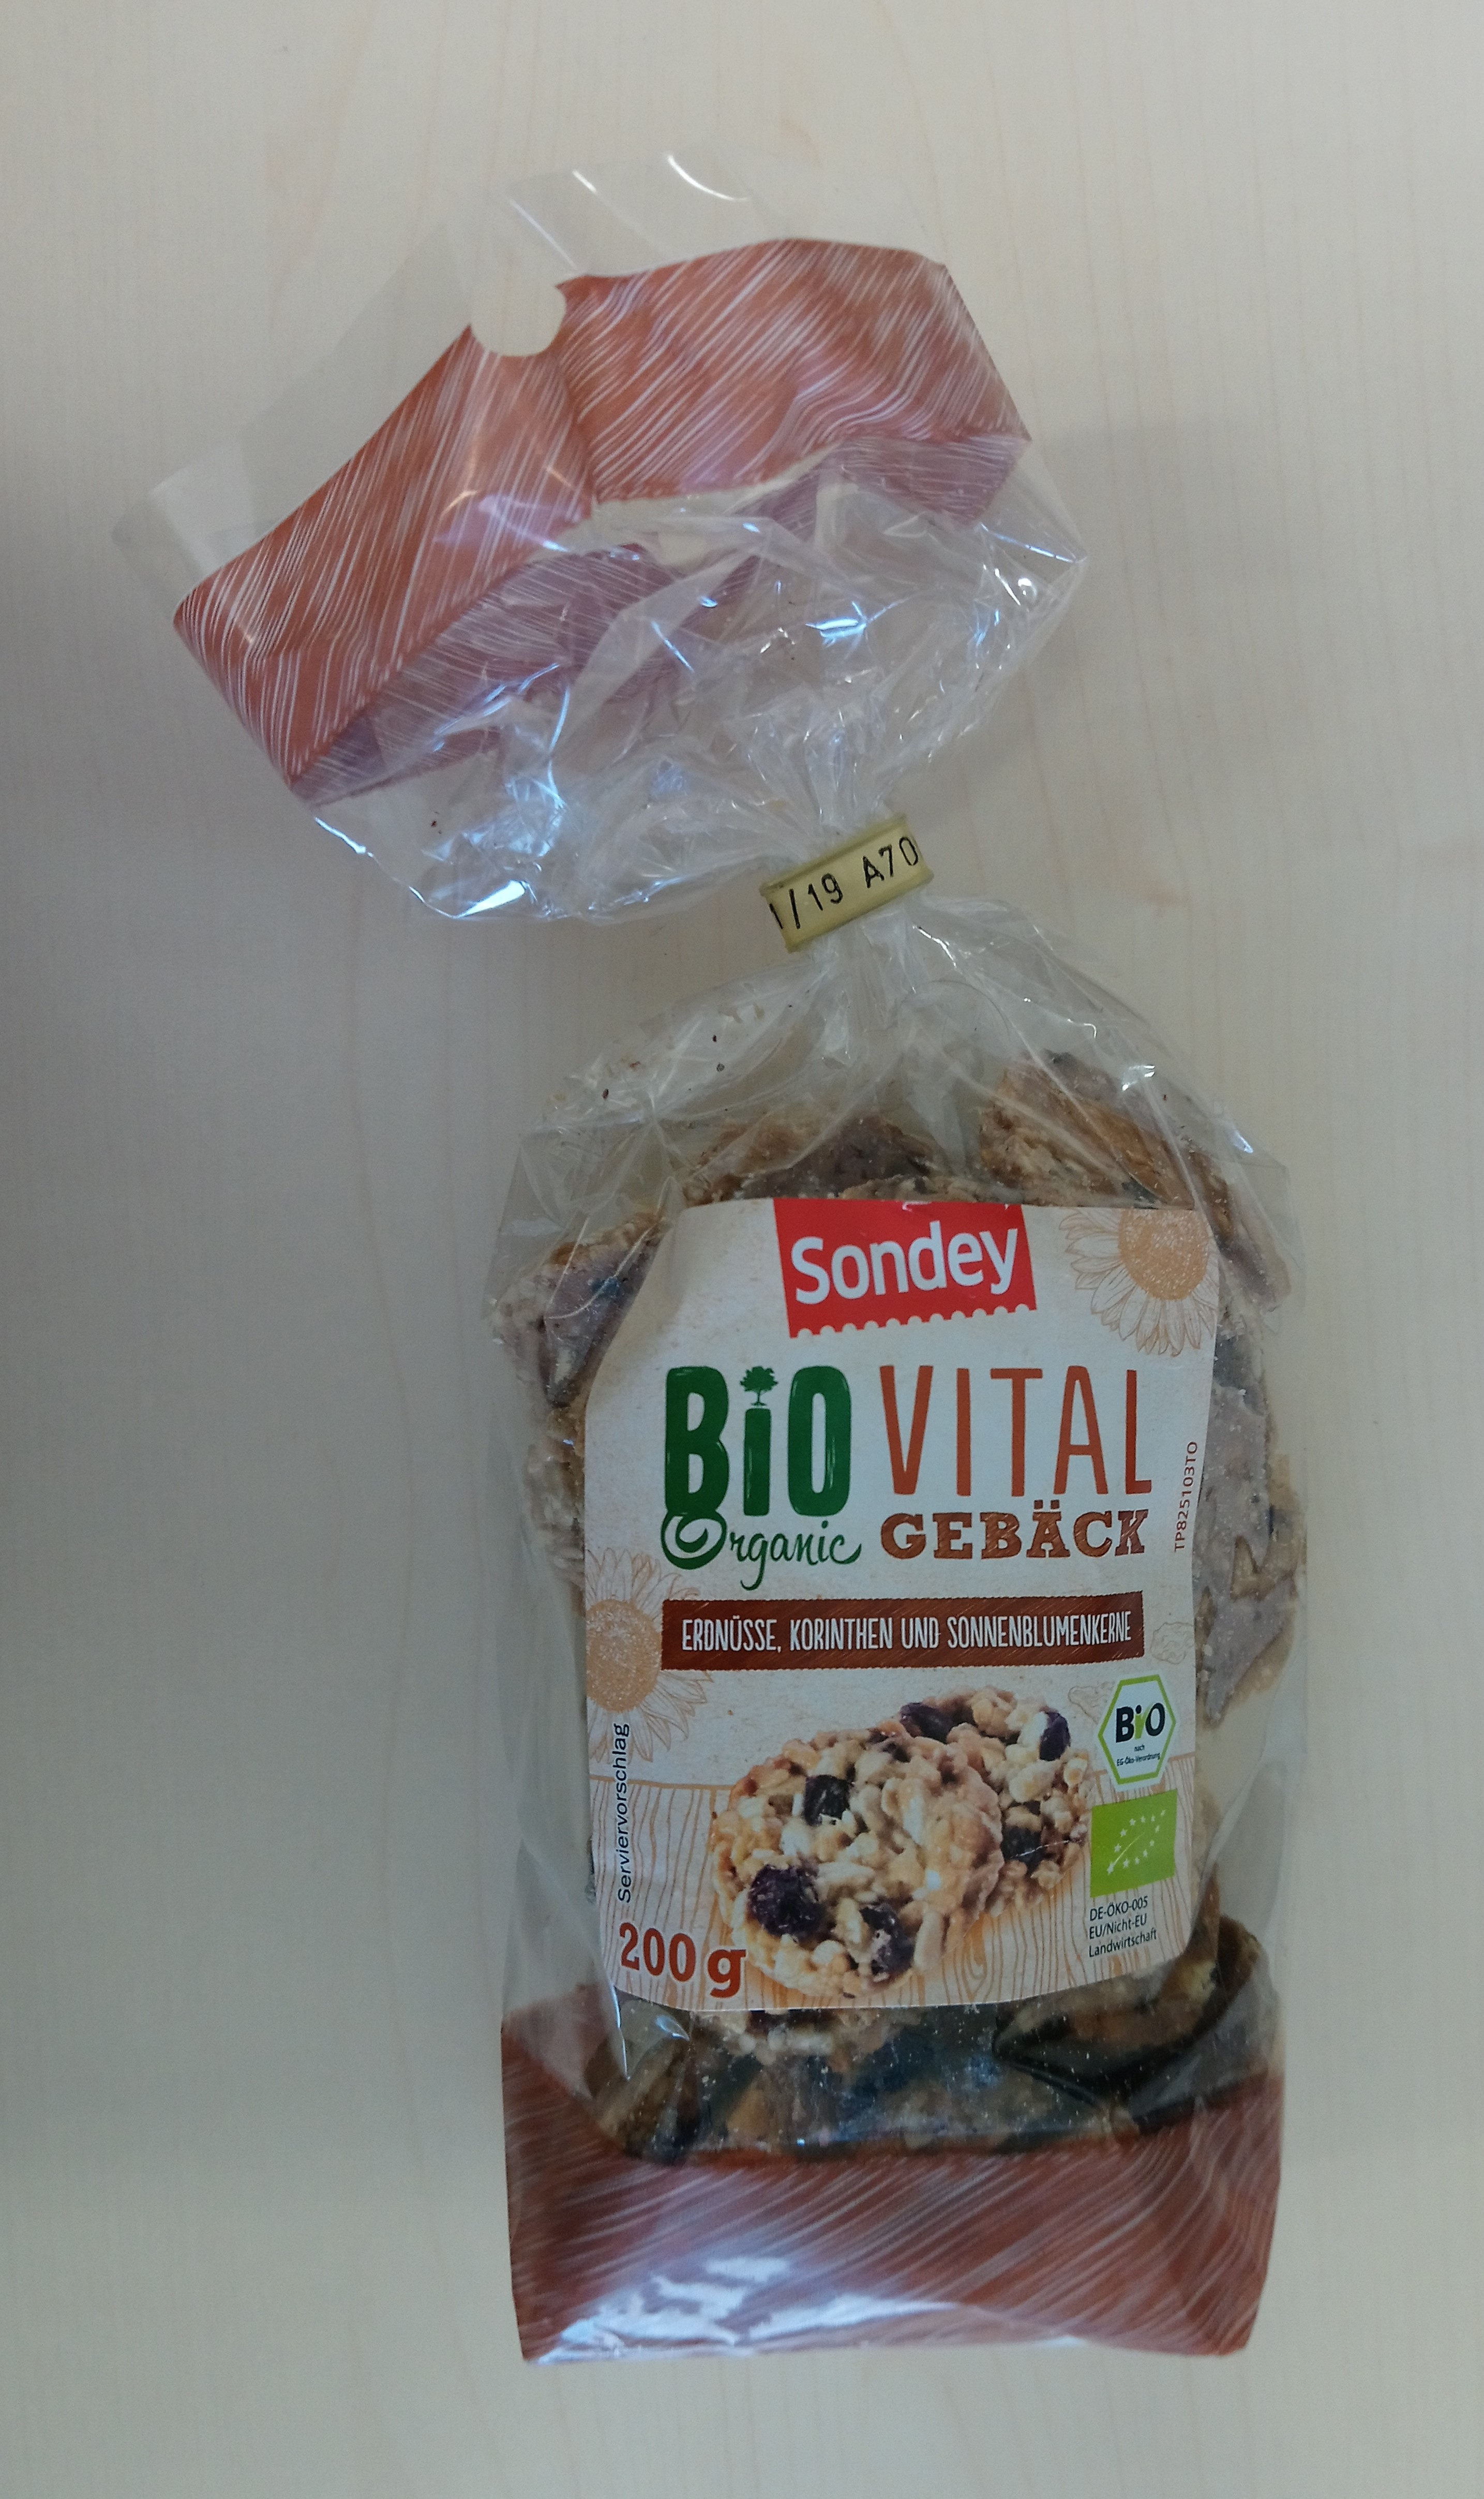 Bio vital organic gebäck - Produit - de